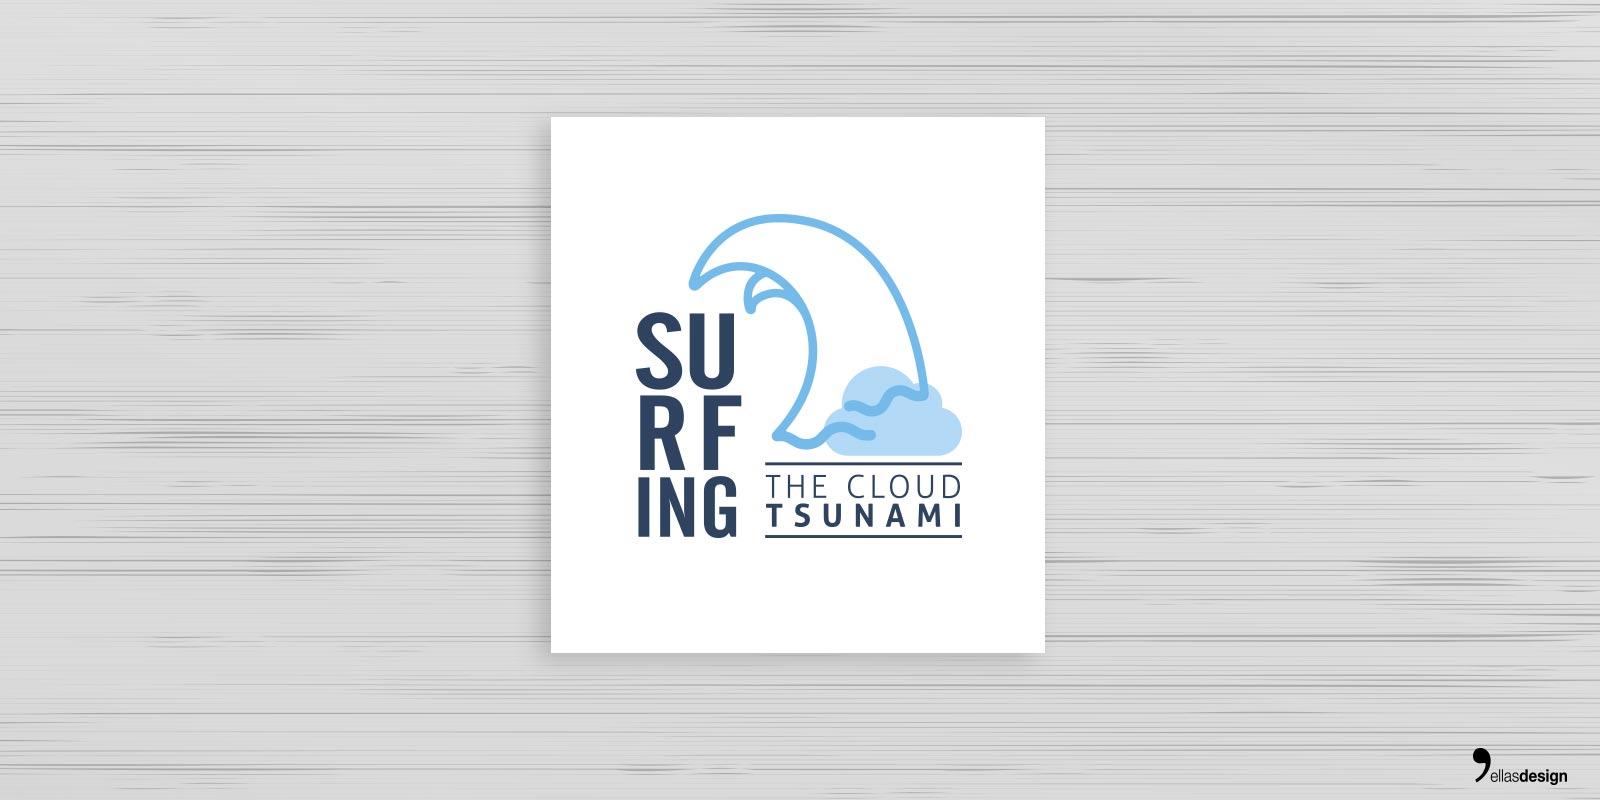 Surfing the Cloud Tsunami